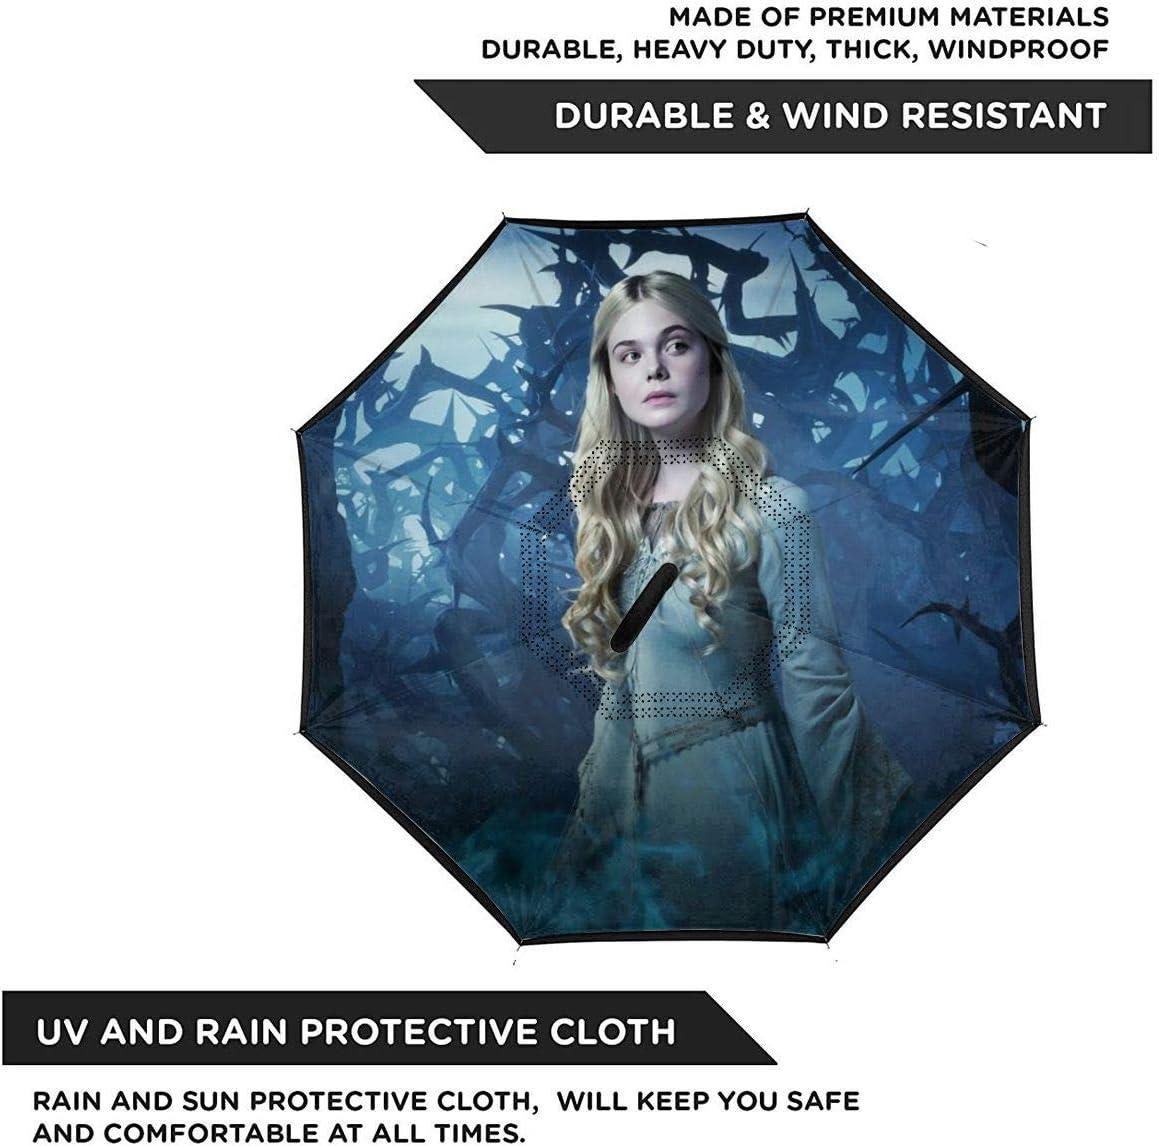 Windproof And Rainproof Double Folding Inverted Umbrella Maleficent Car Reverse Umbrella With C-Shaped Handle UV Protection Inverted Folding Umbrellas